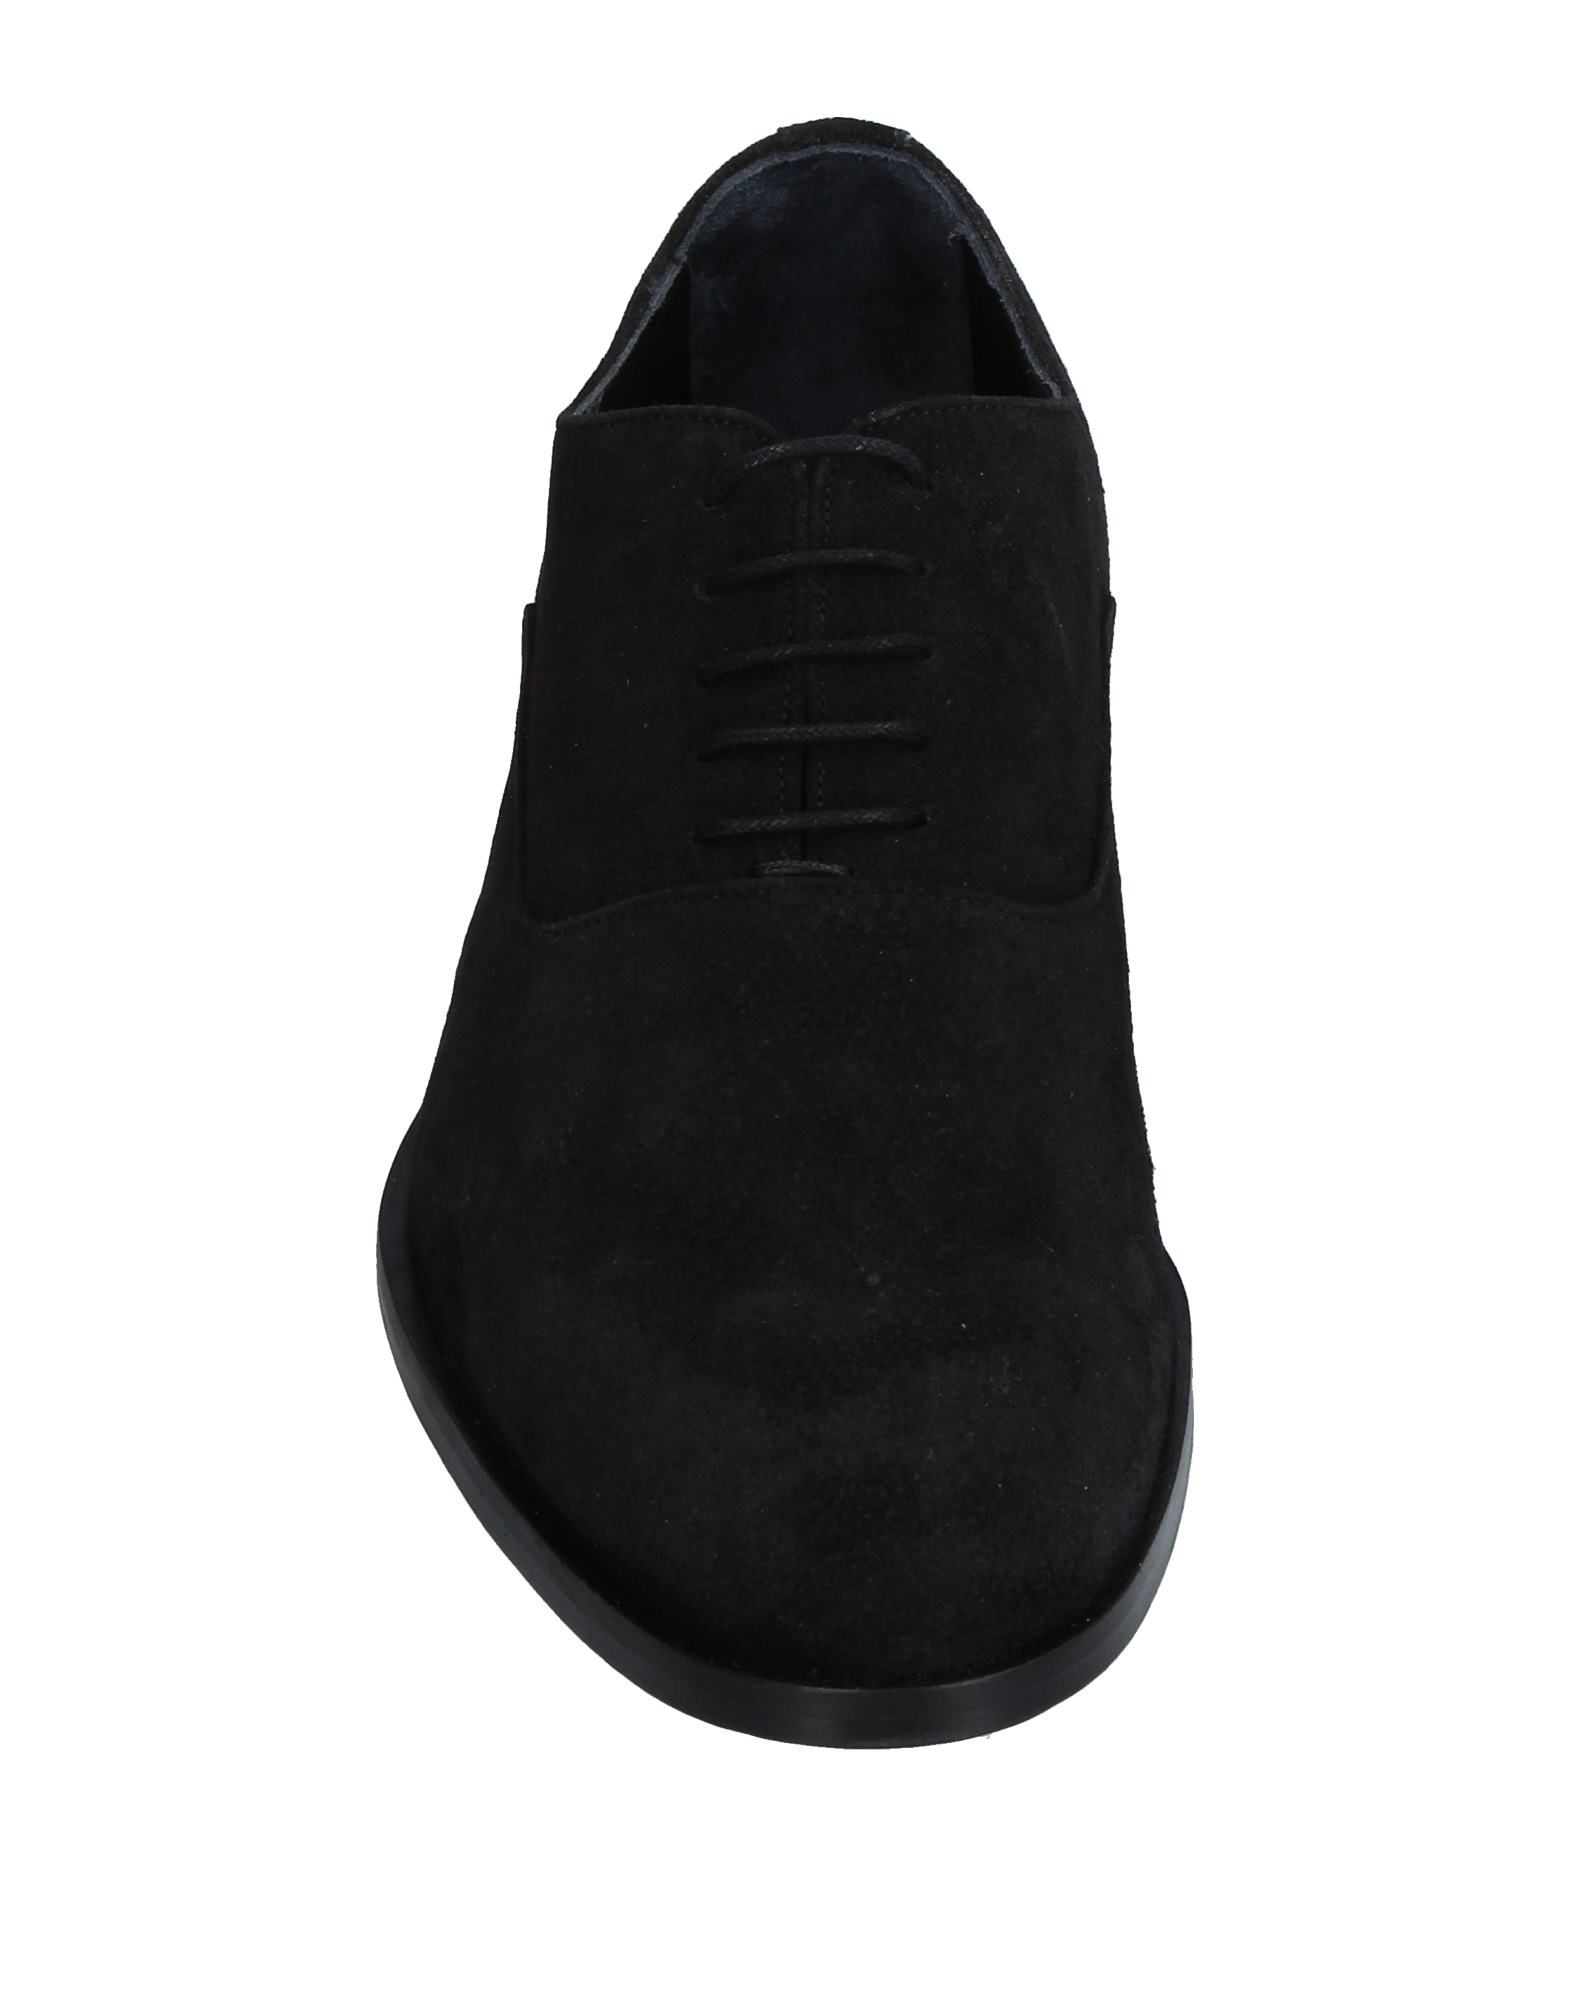 Chaussures À Lacets Alessandro Dellacqua Homme - Chaussures À Lacets Alessandro Dellacqua sur